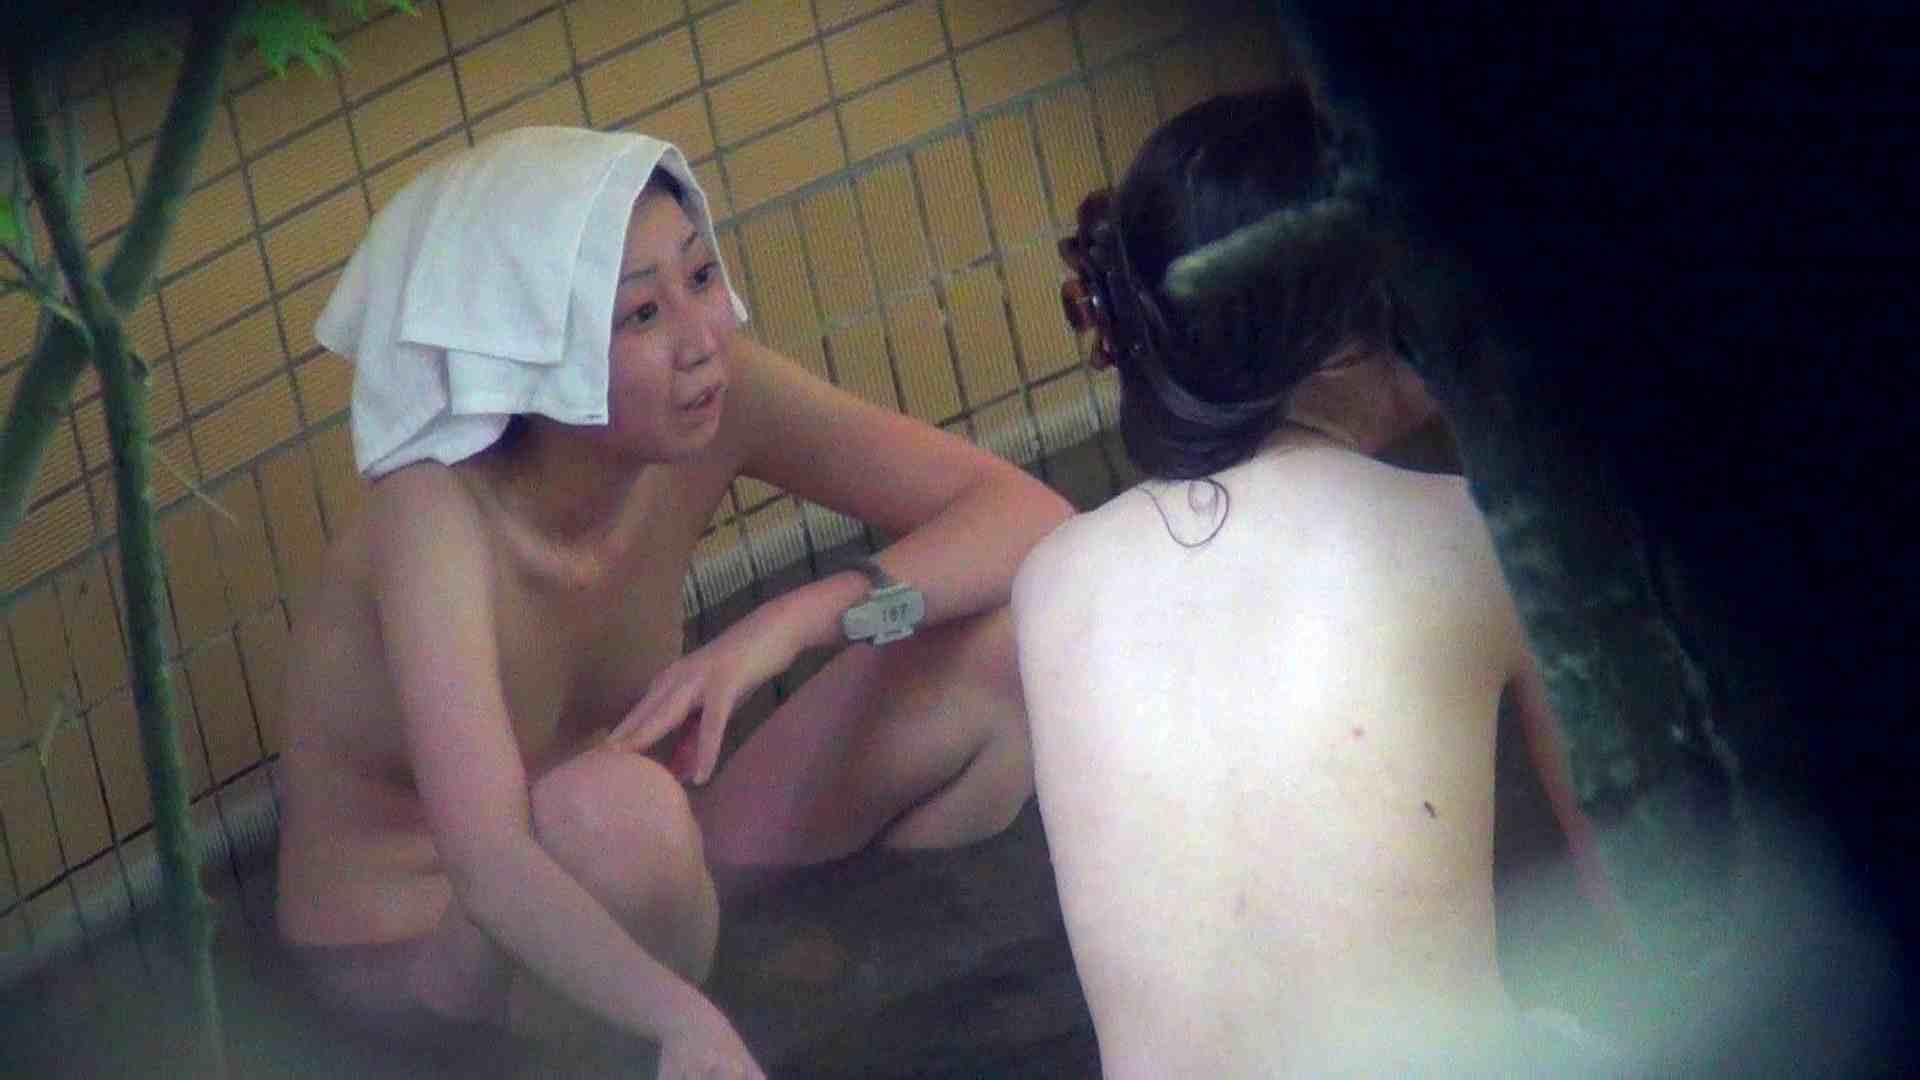 Vol.44 アラサー三人露天風呂女子会開催中 グループ おめこ無修正動画無料 112画像 87